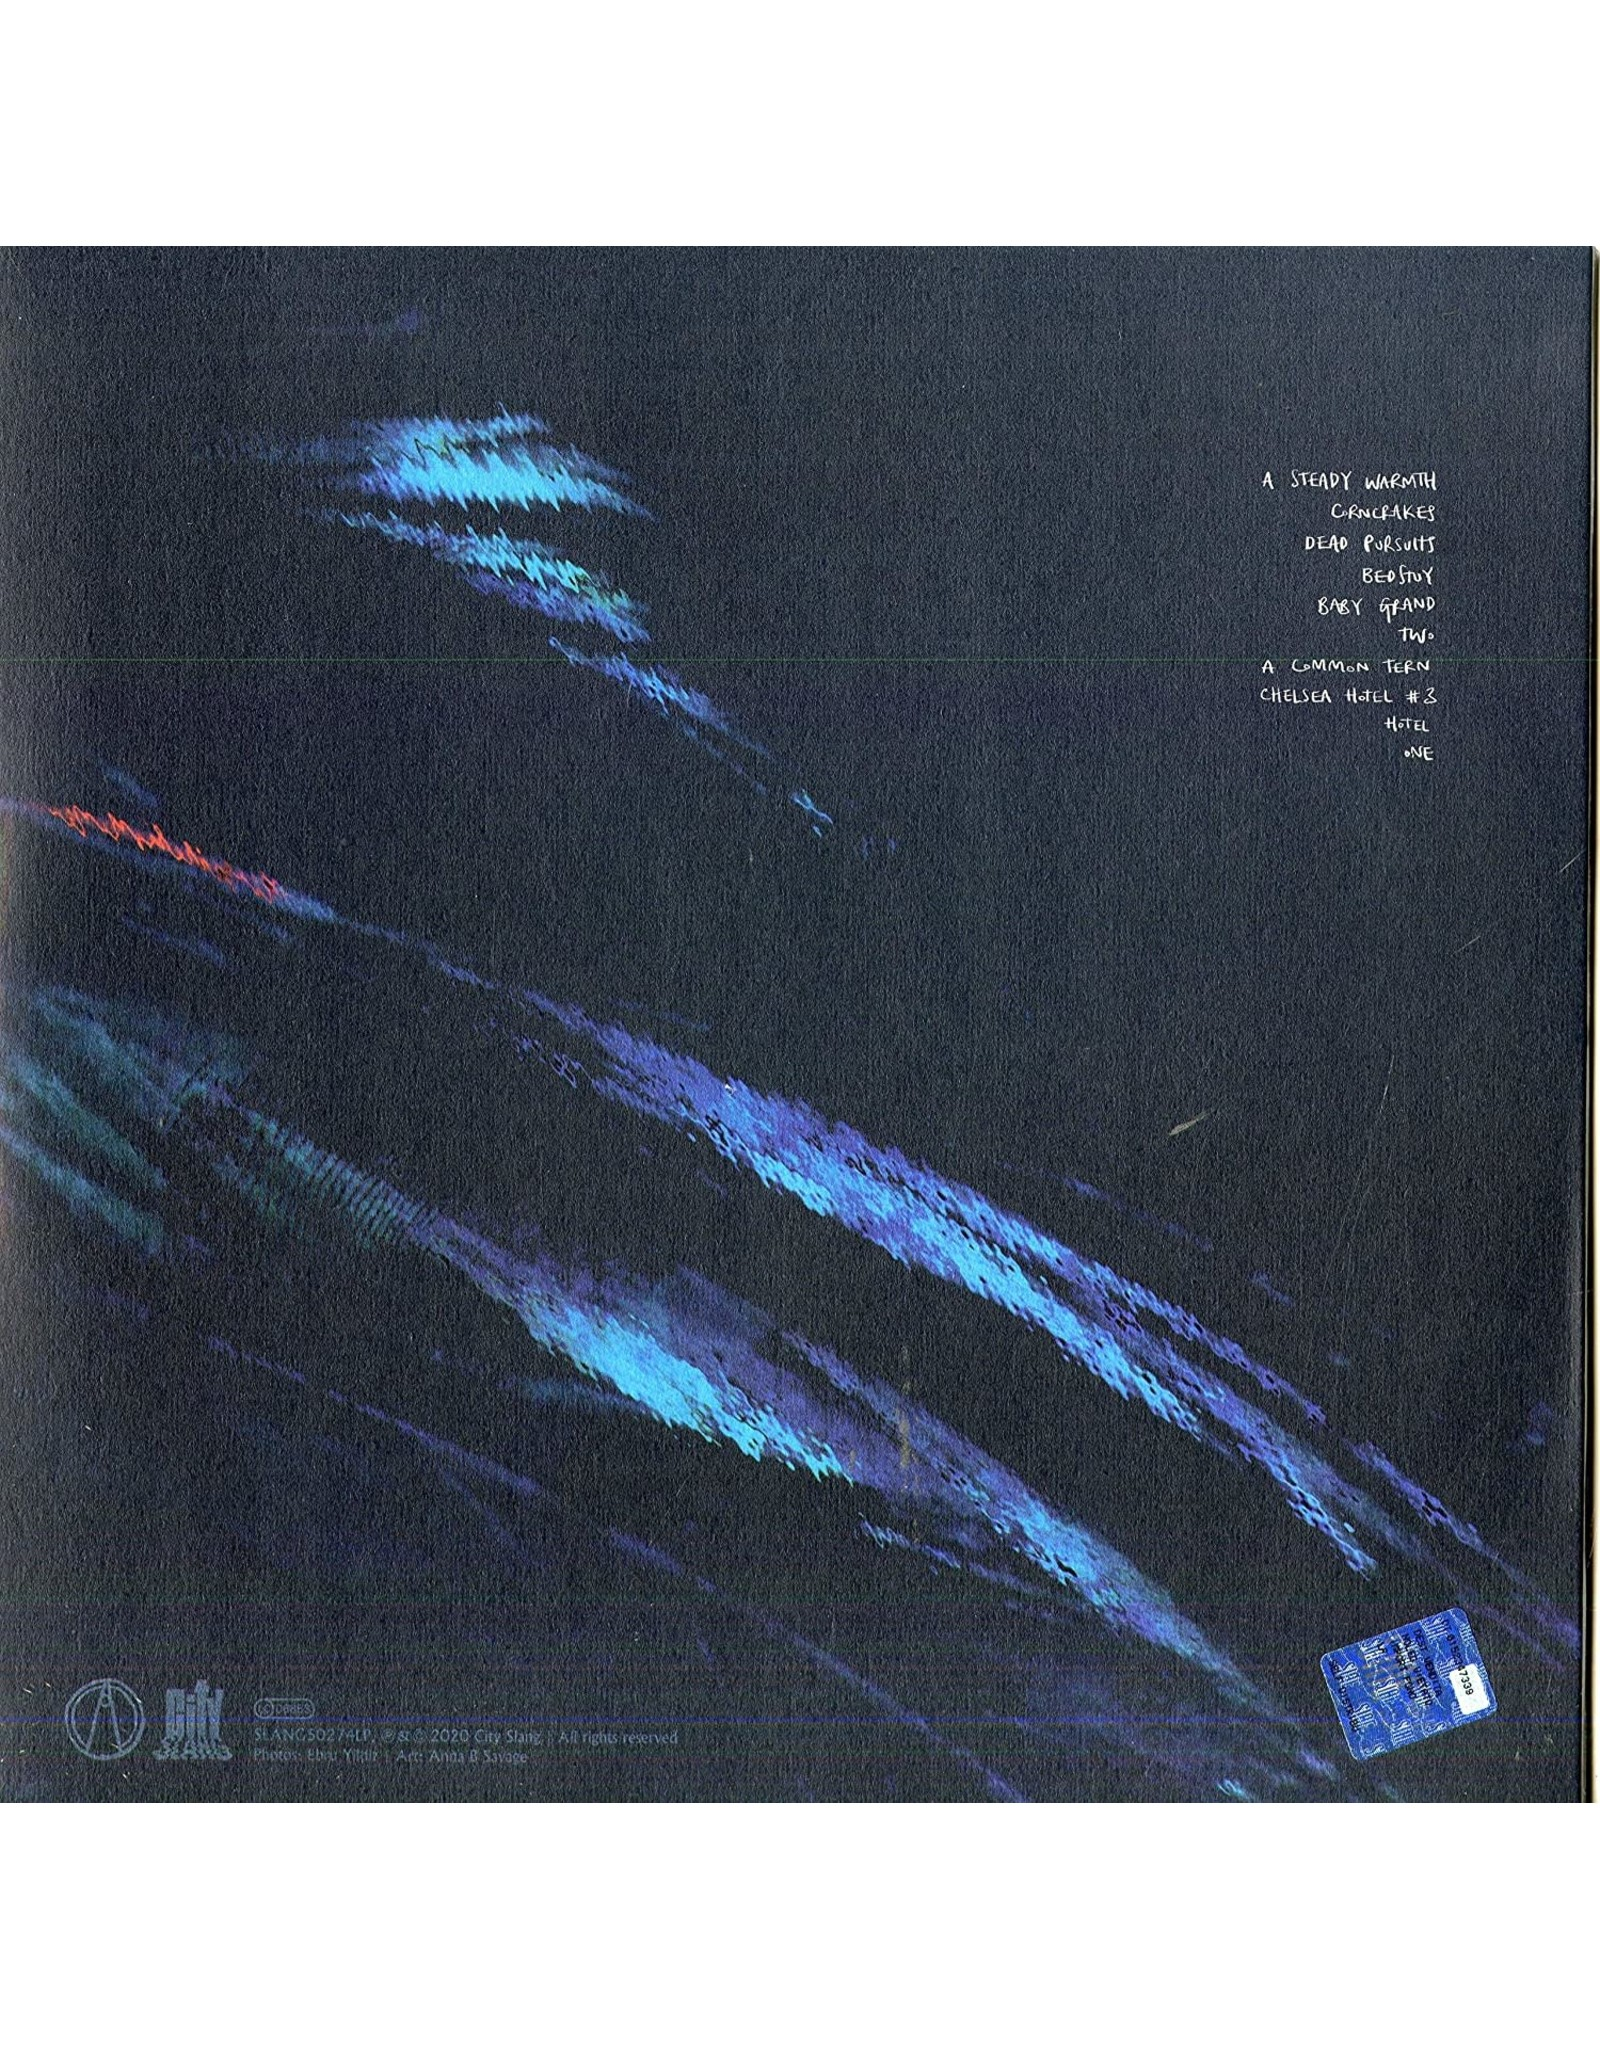 Anna B Savage - A Common Turn (Exclusive Dark Blue Vinyl)